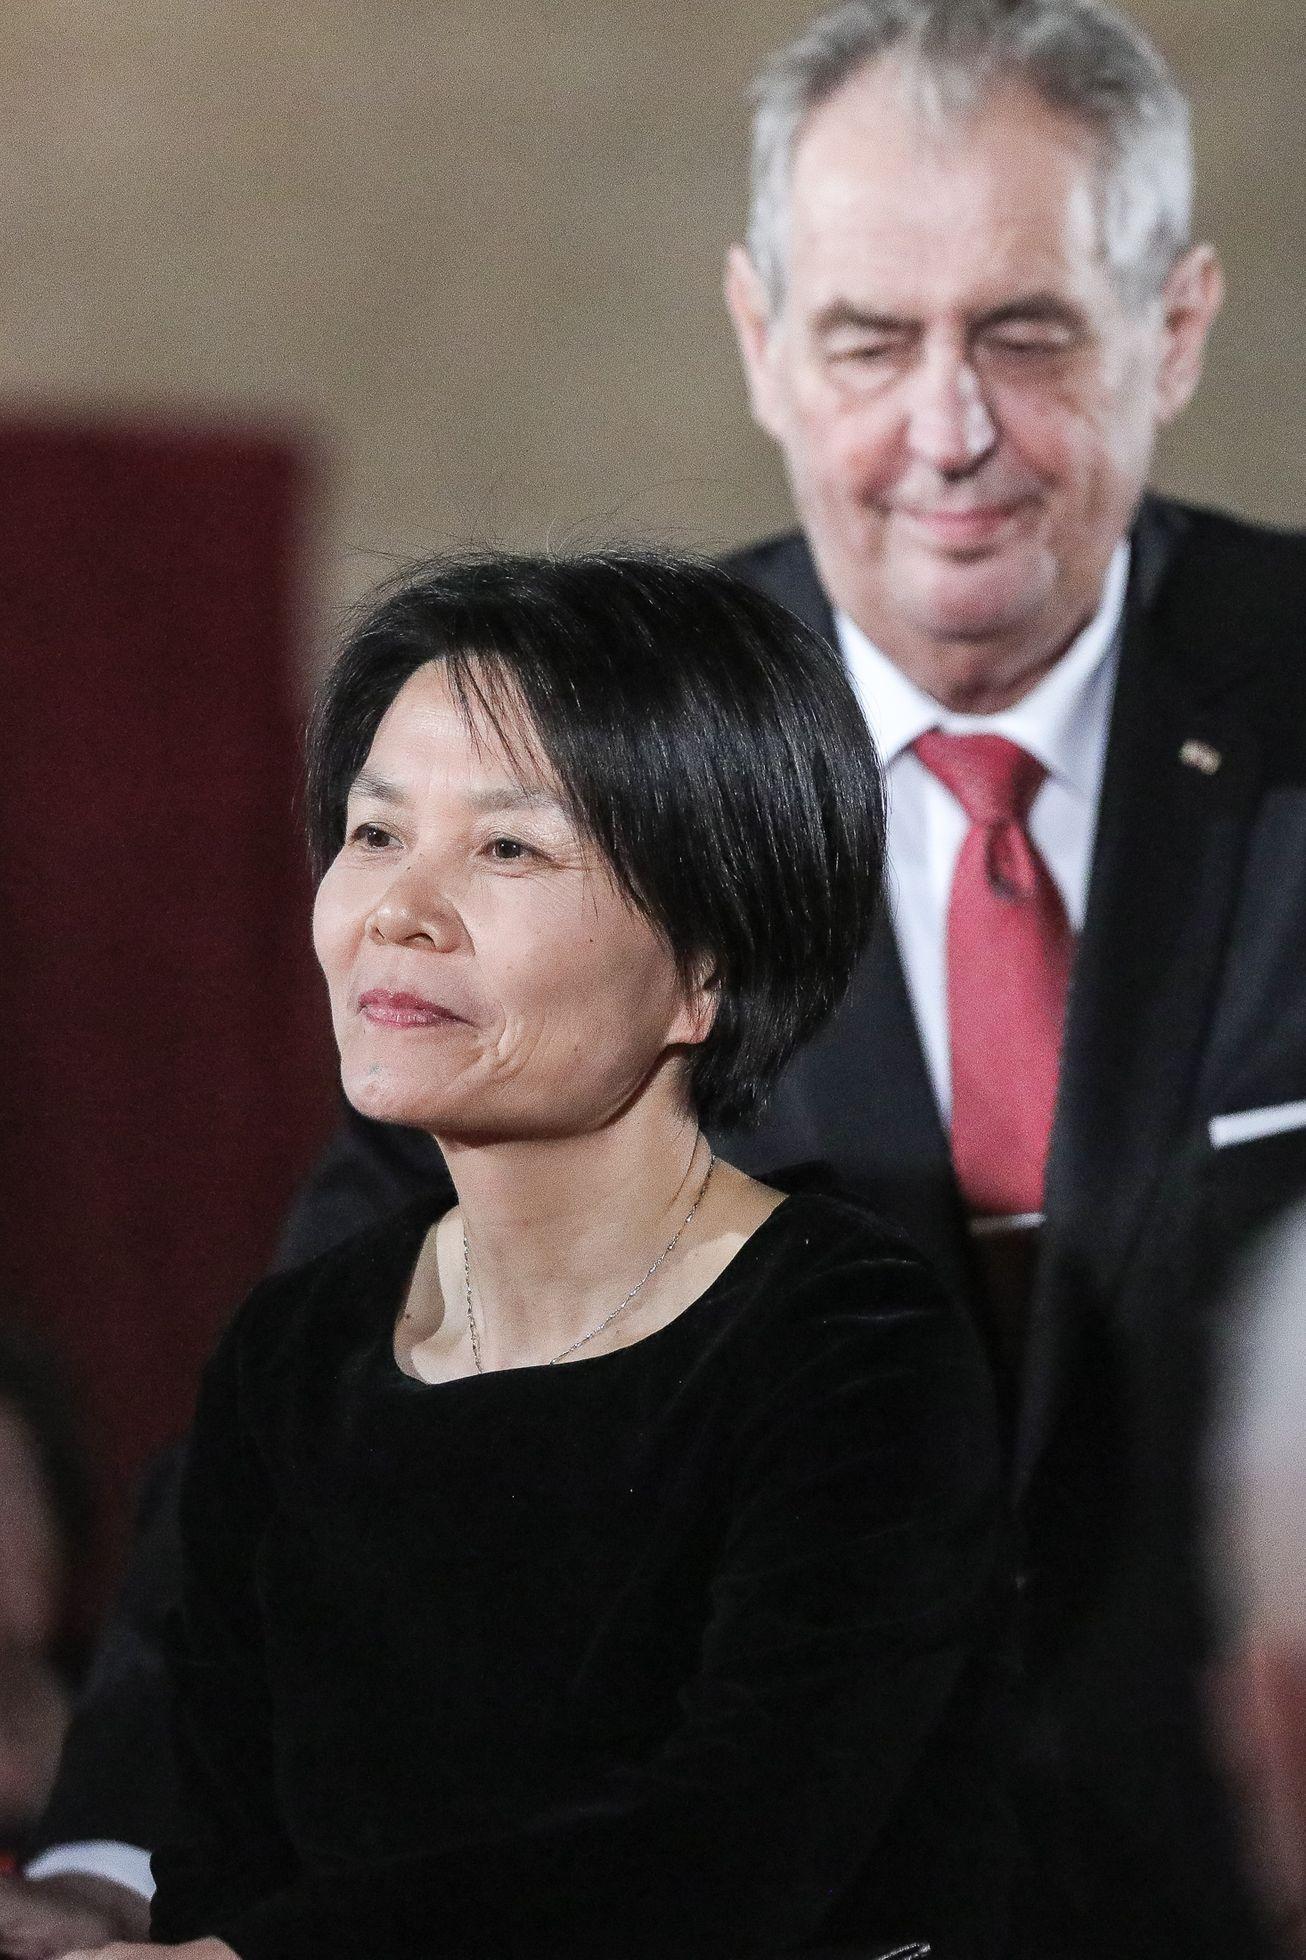 """Za zásluhy o stát voblasti výchovy"" obdržela medaili čínská bohemistka Sü Wej-ču."